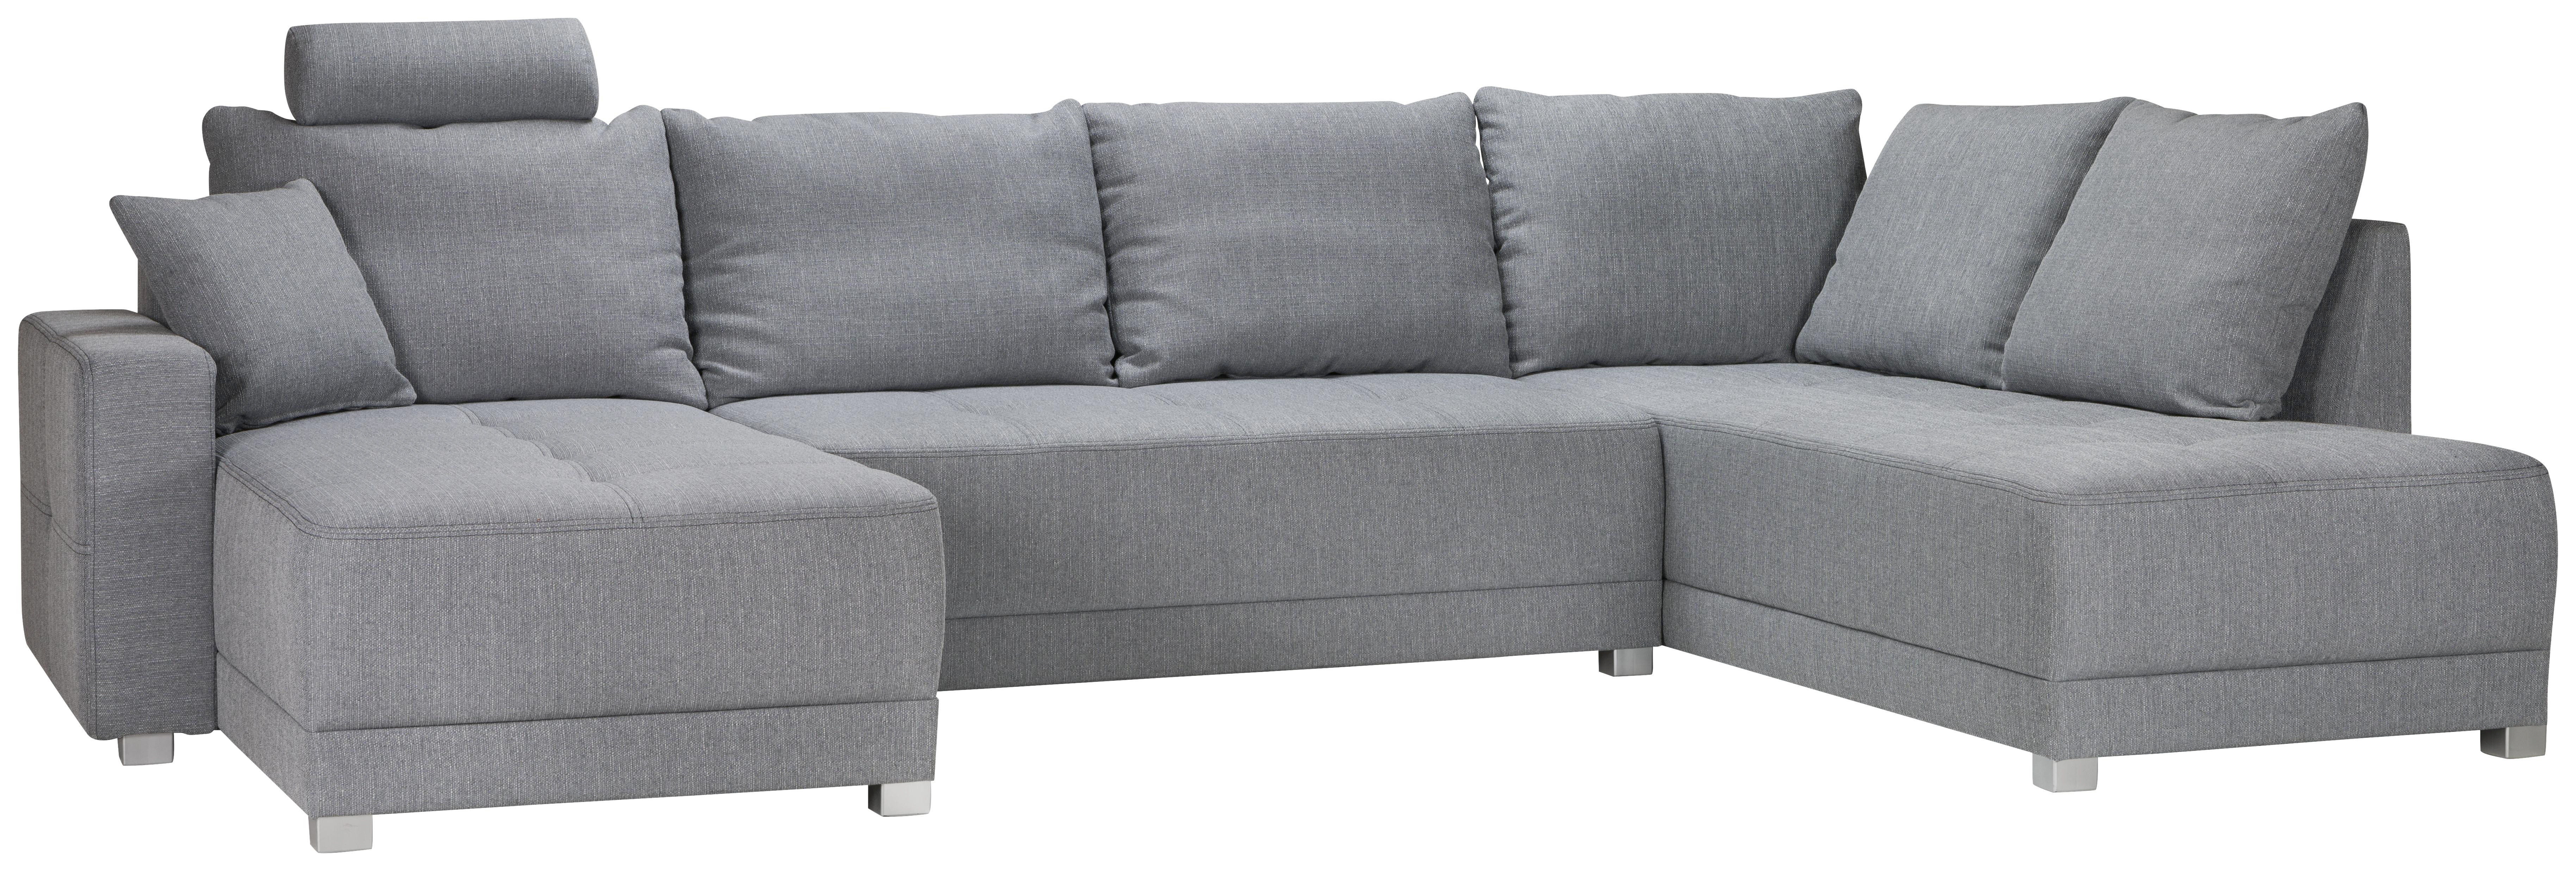 SOFFA - ljusgrå/silver, Design, textil/plast (328/86/168cm) - Xora